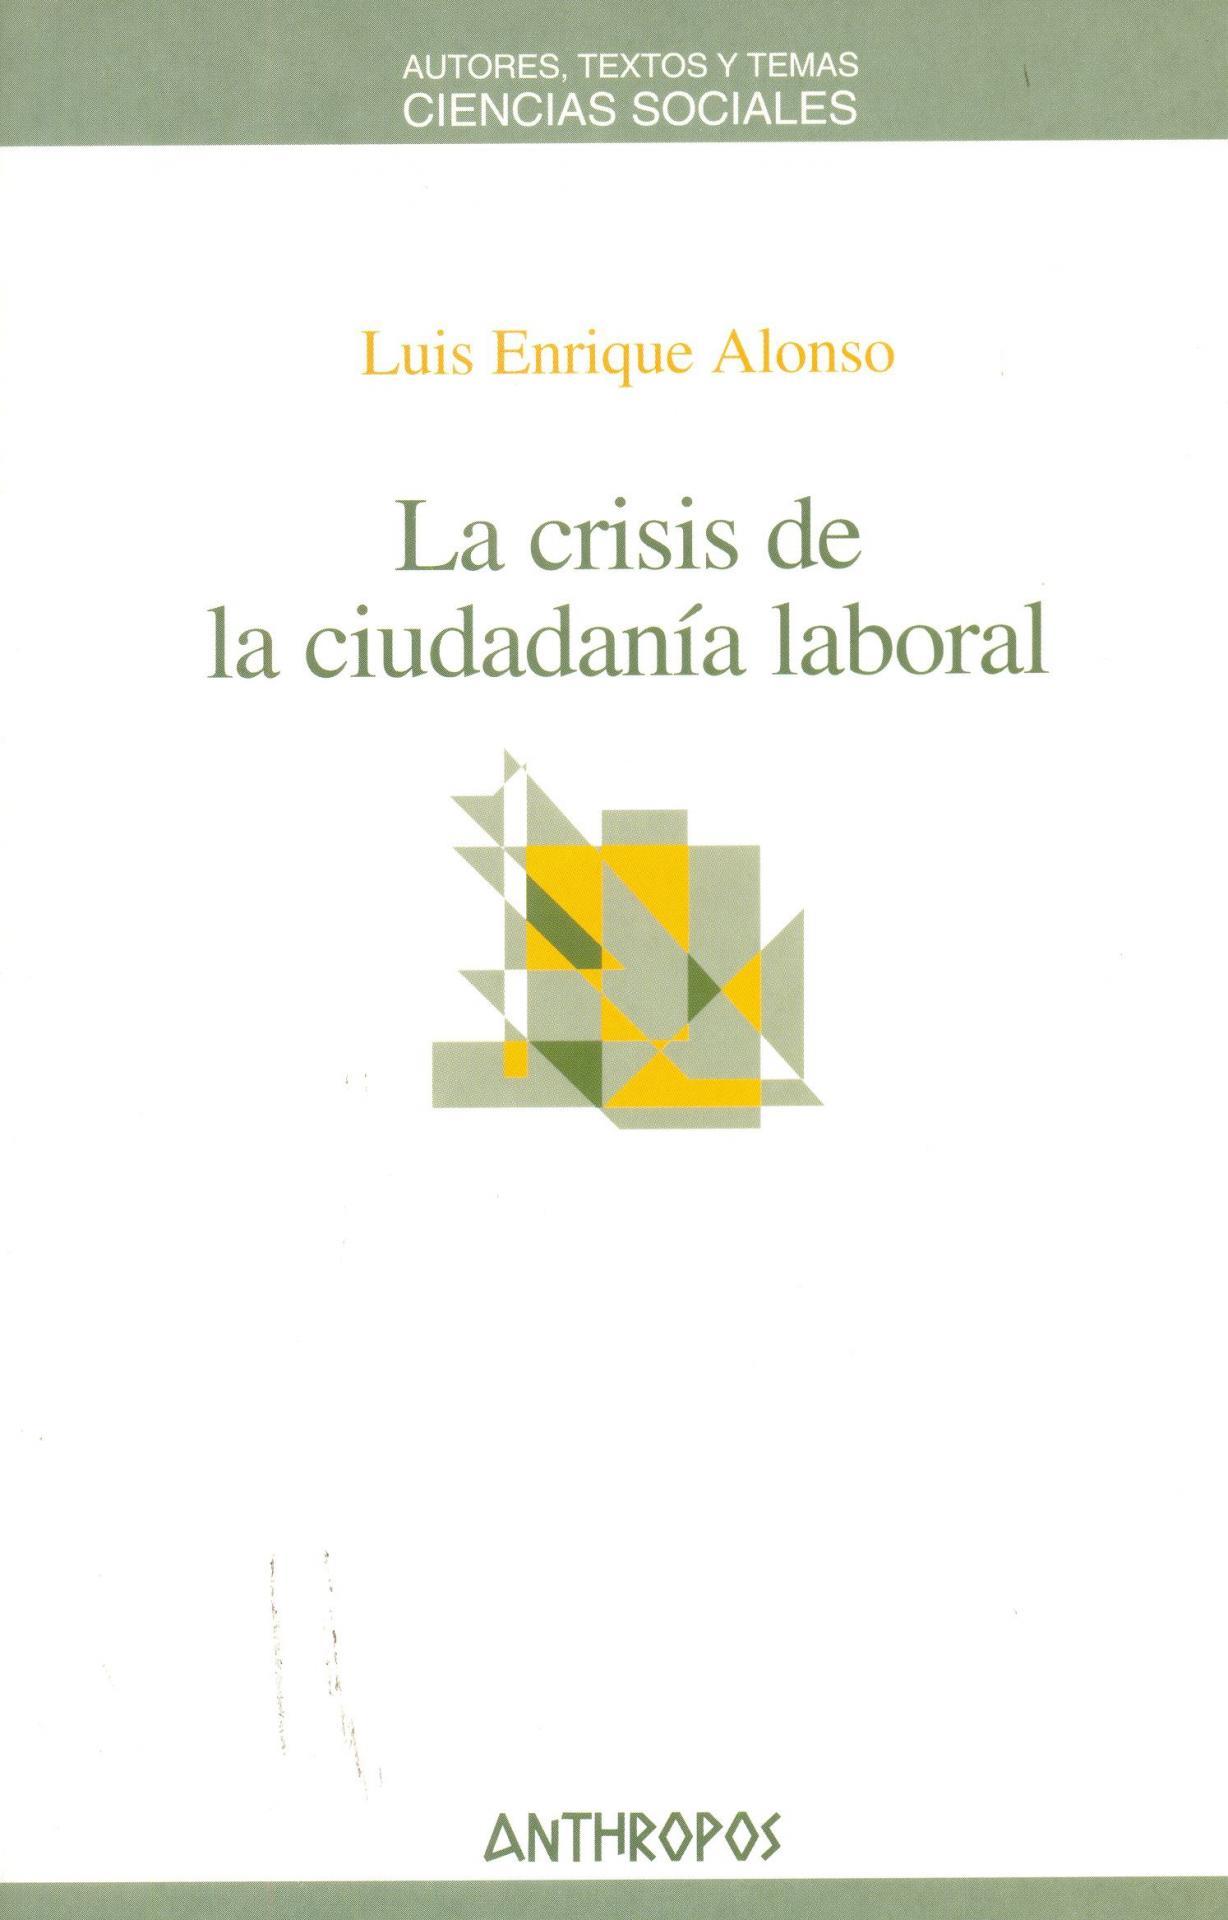 LA CRISIS DE LA CIUDADANÍA LABORAL. Alonso, L.E.